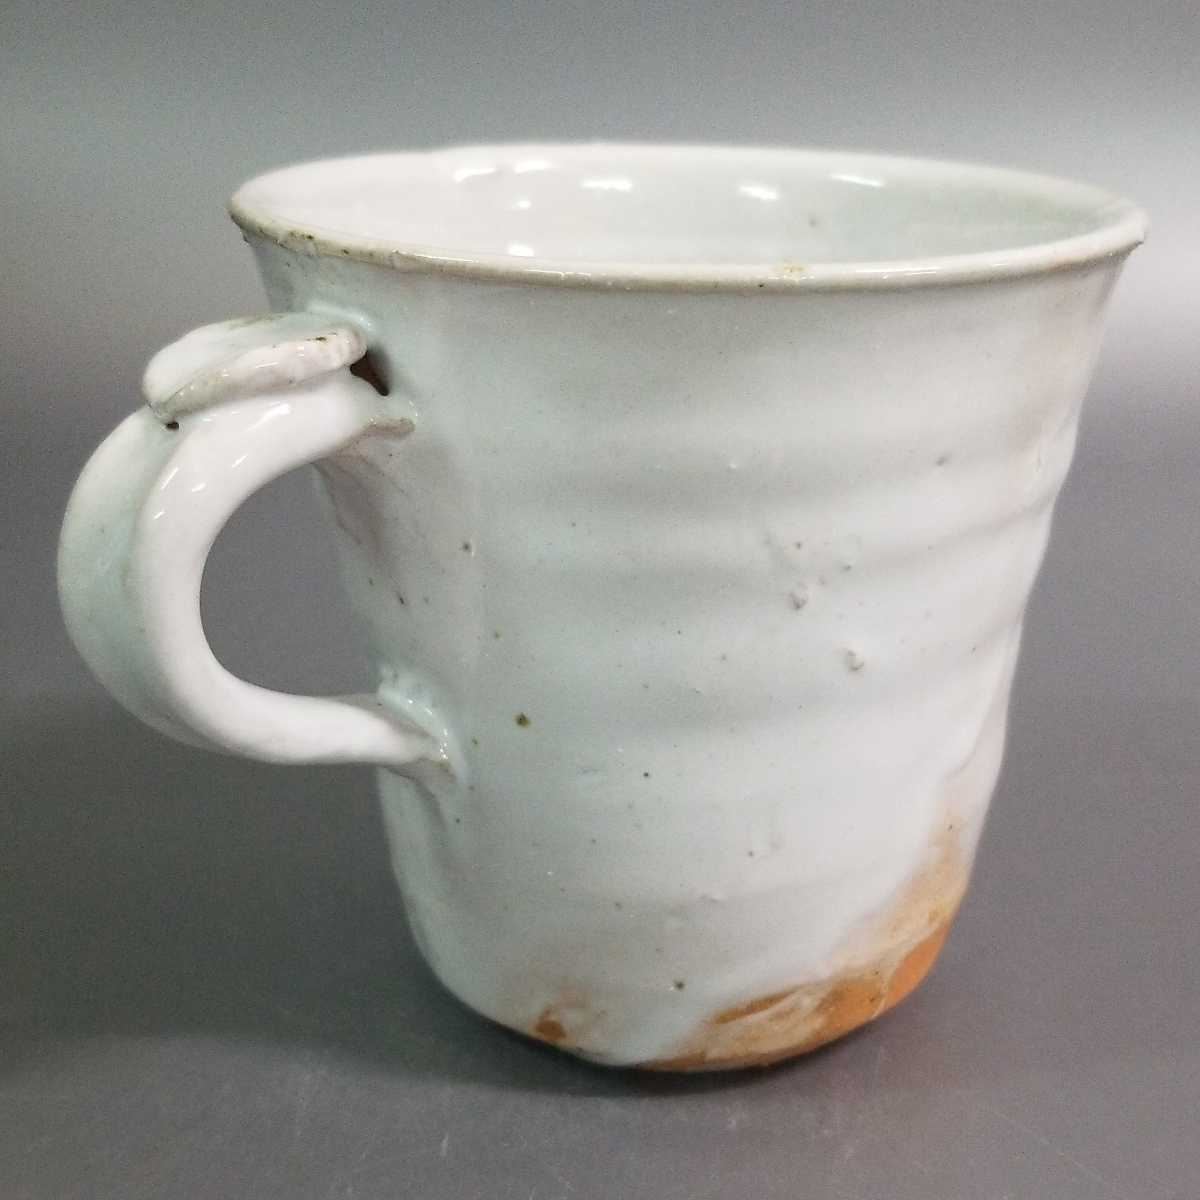 賜72)萩焼 渋谷泥詩 白萩マグカップ 珈琲器 茶器 未使用新品 同梱歓迎 _画像3